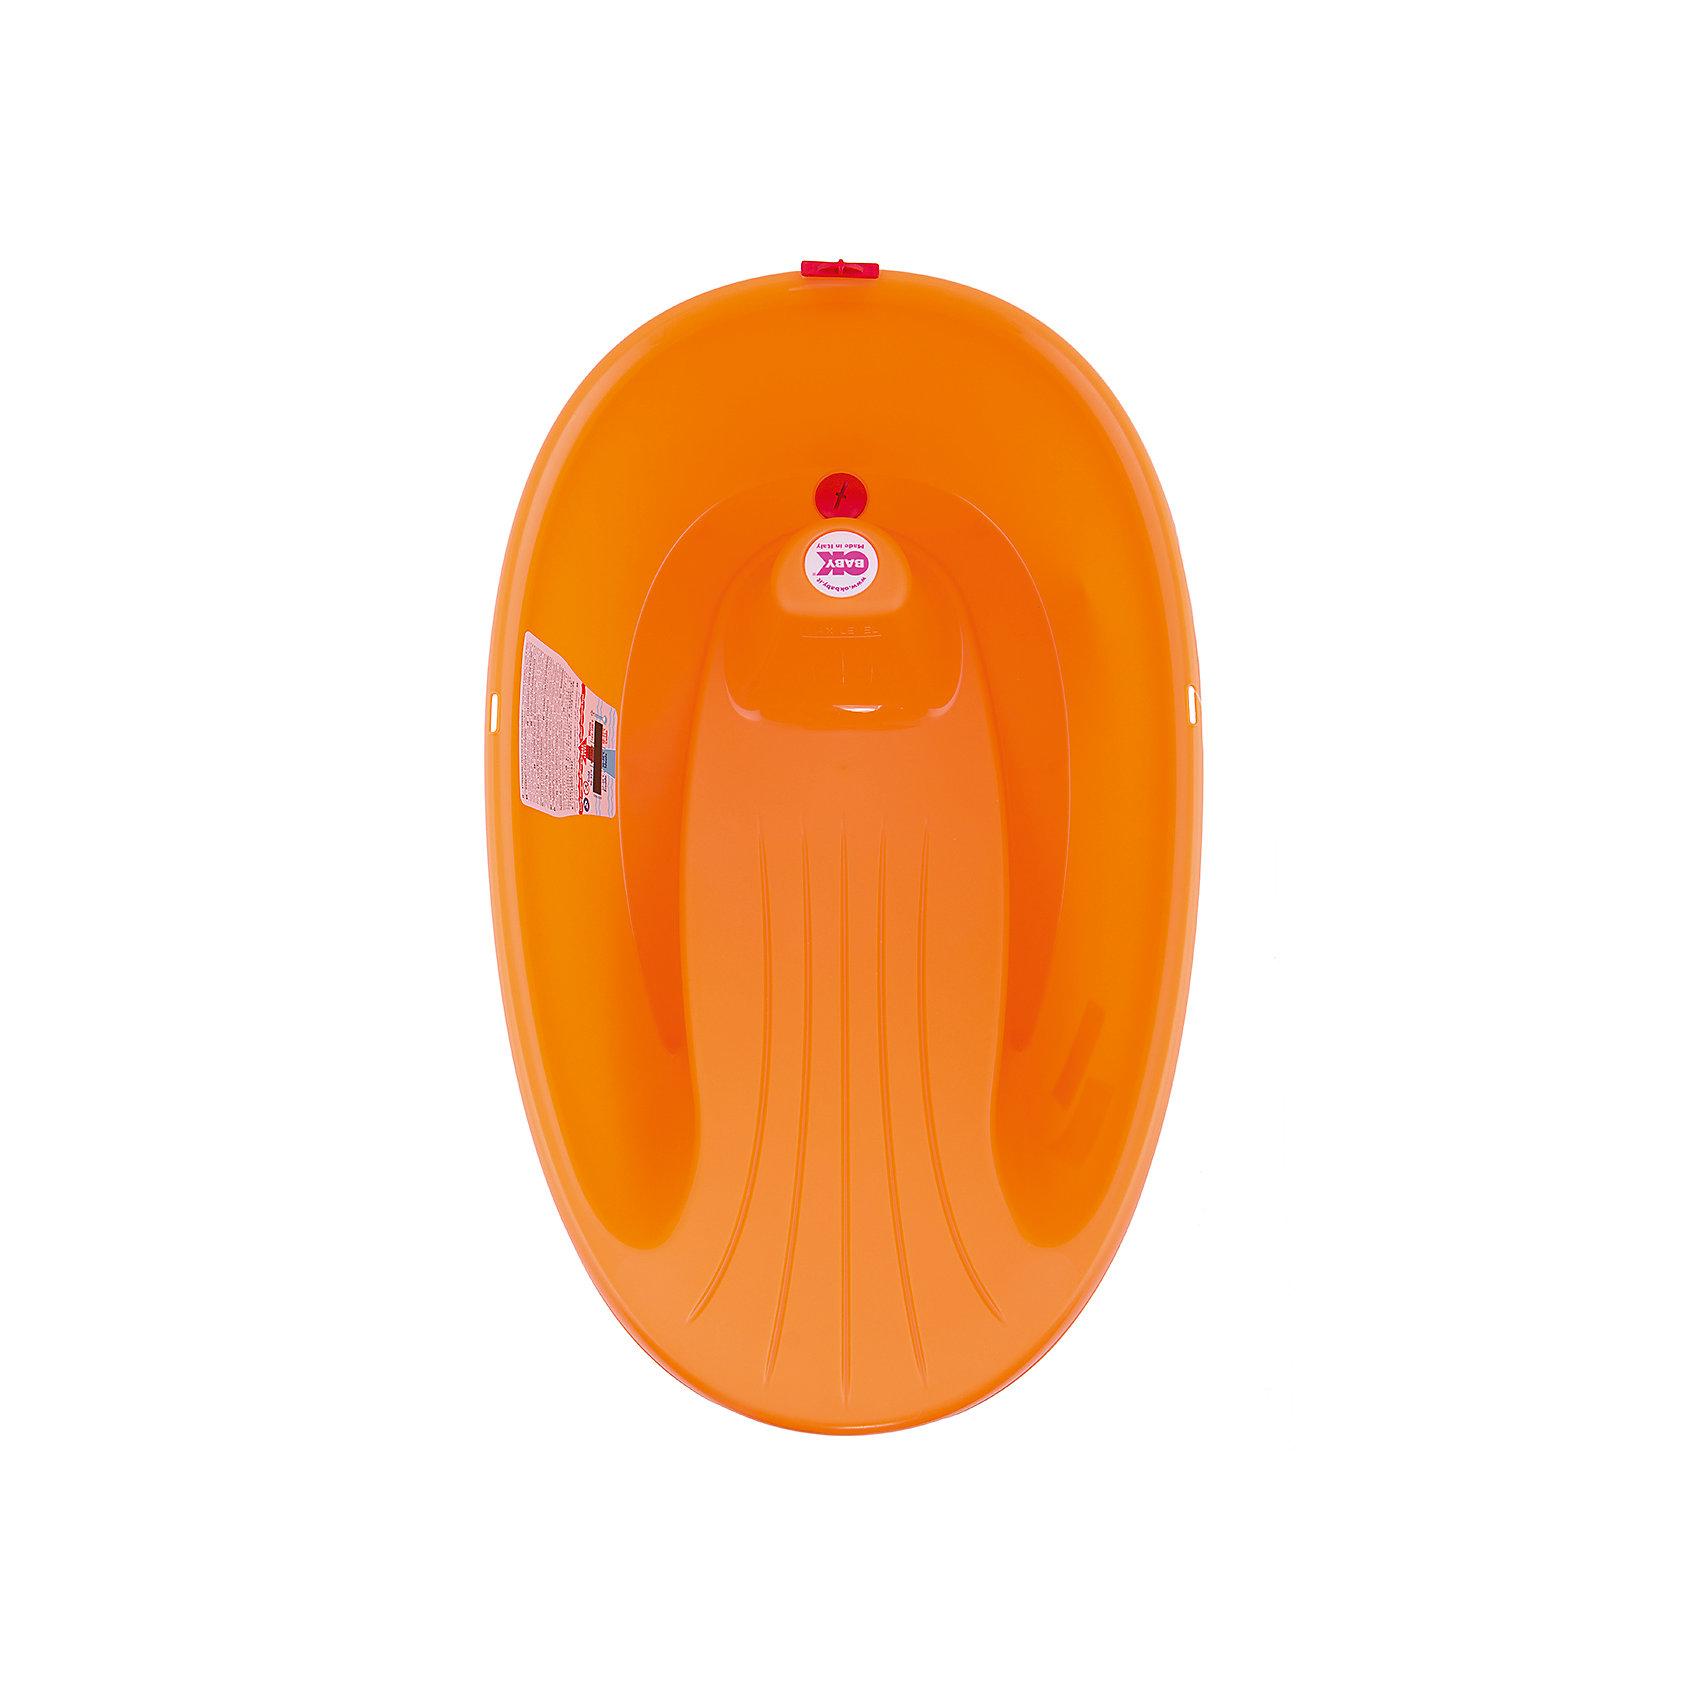 Ванночка Onda, Ok Baby, оранжевый (OK Baby)